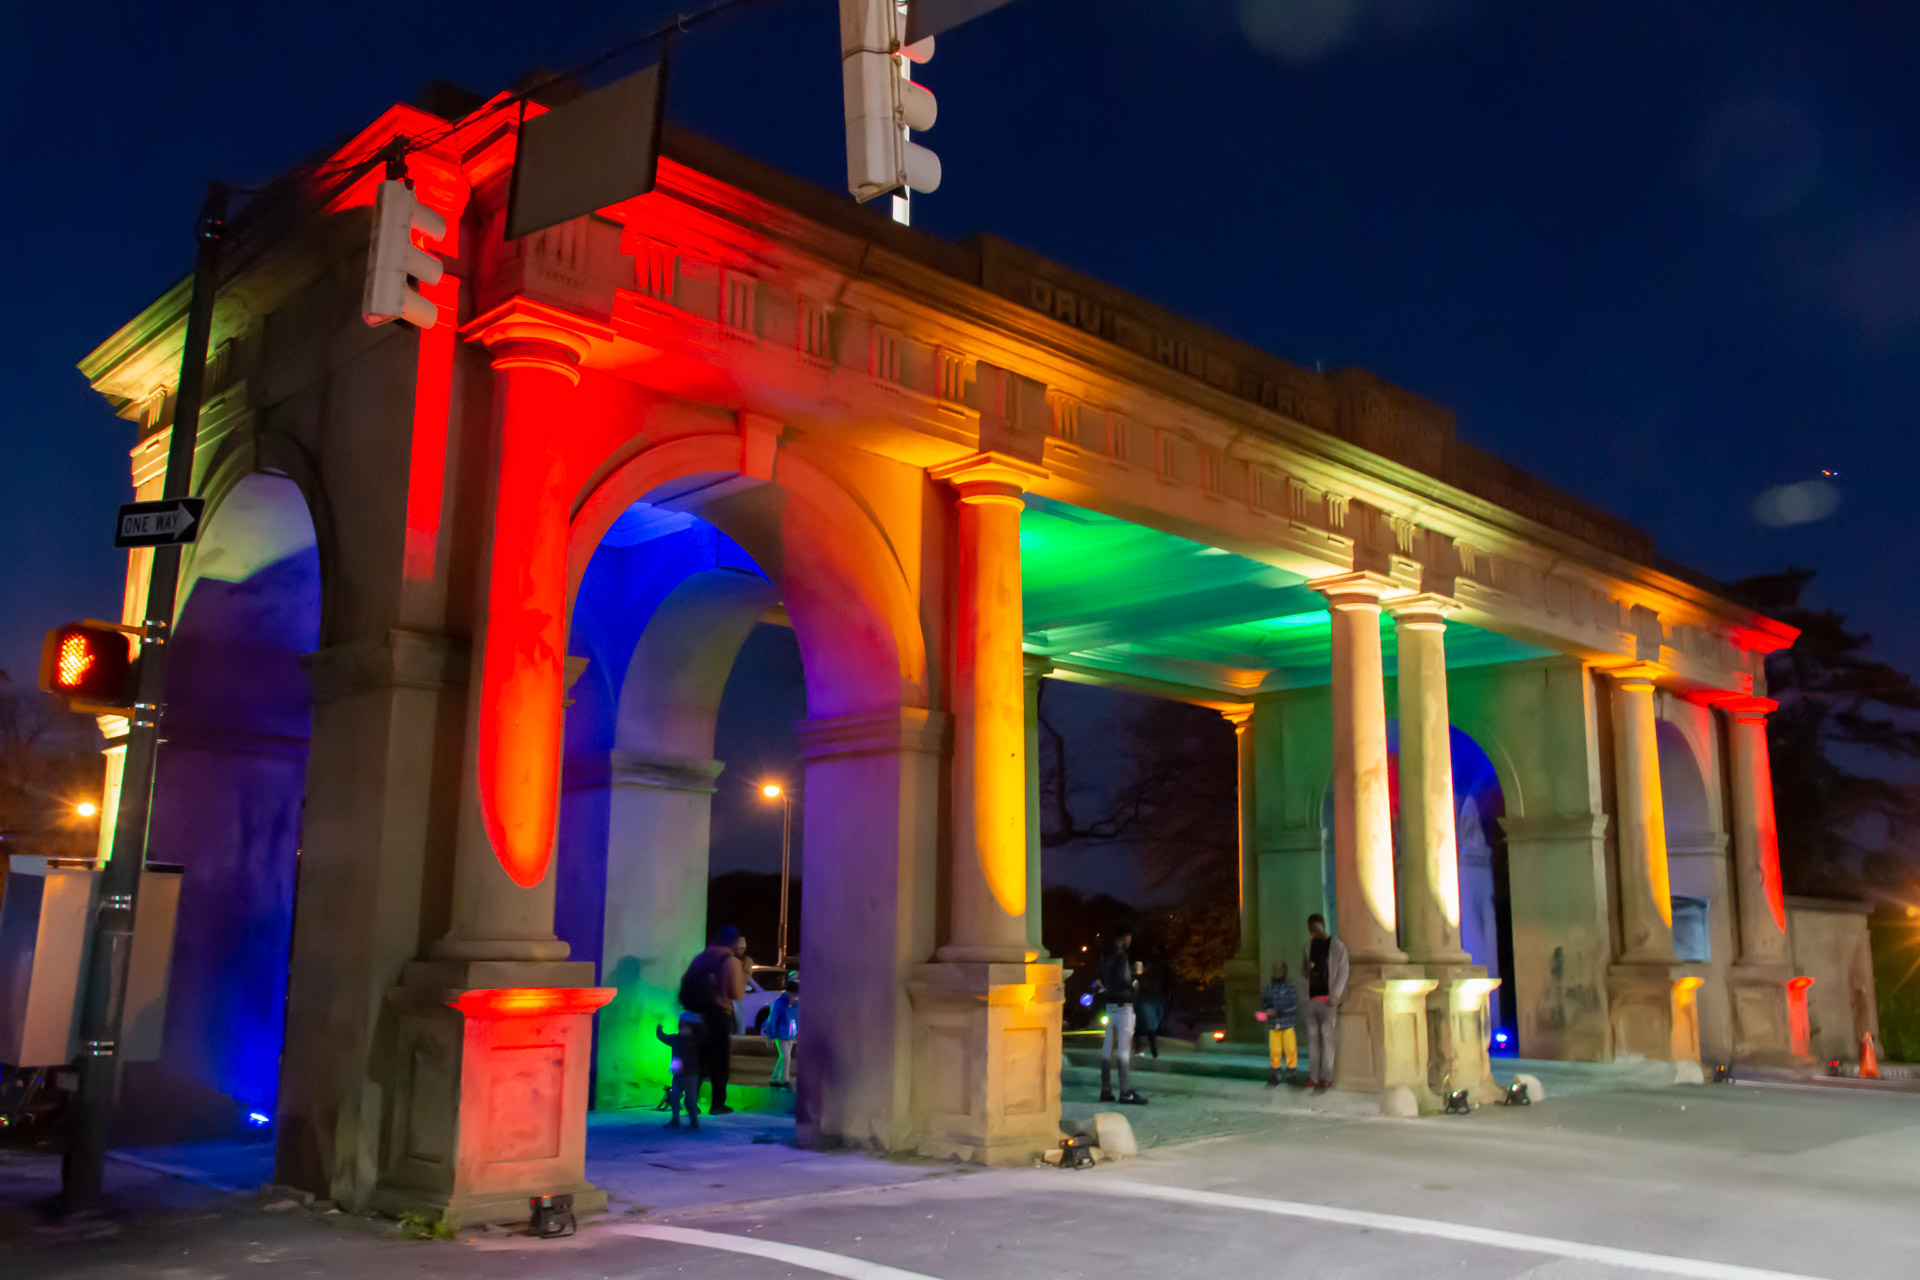 Arches & Access - Druid Hill Park Gate light art